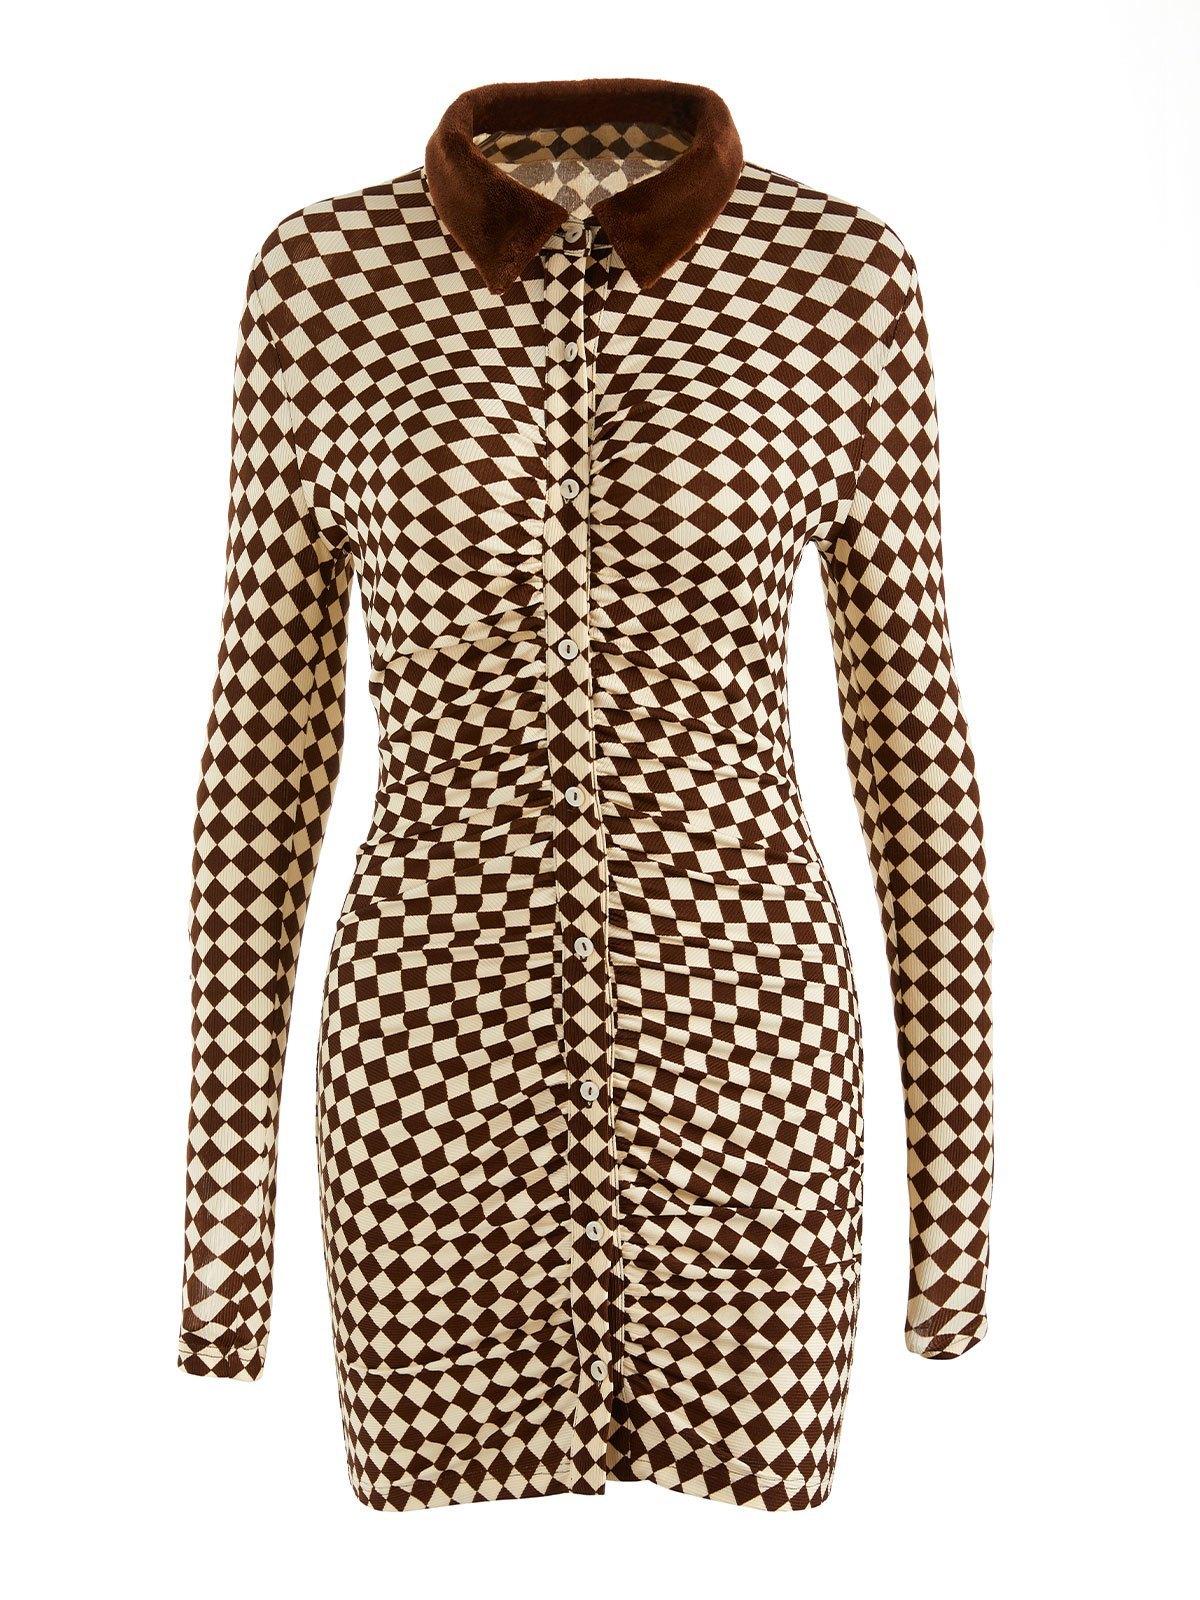 EMMIOL Polo Neck Checkered Long Sleeve Midi Dress - Brown S